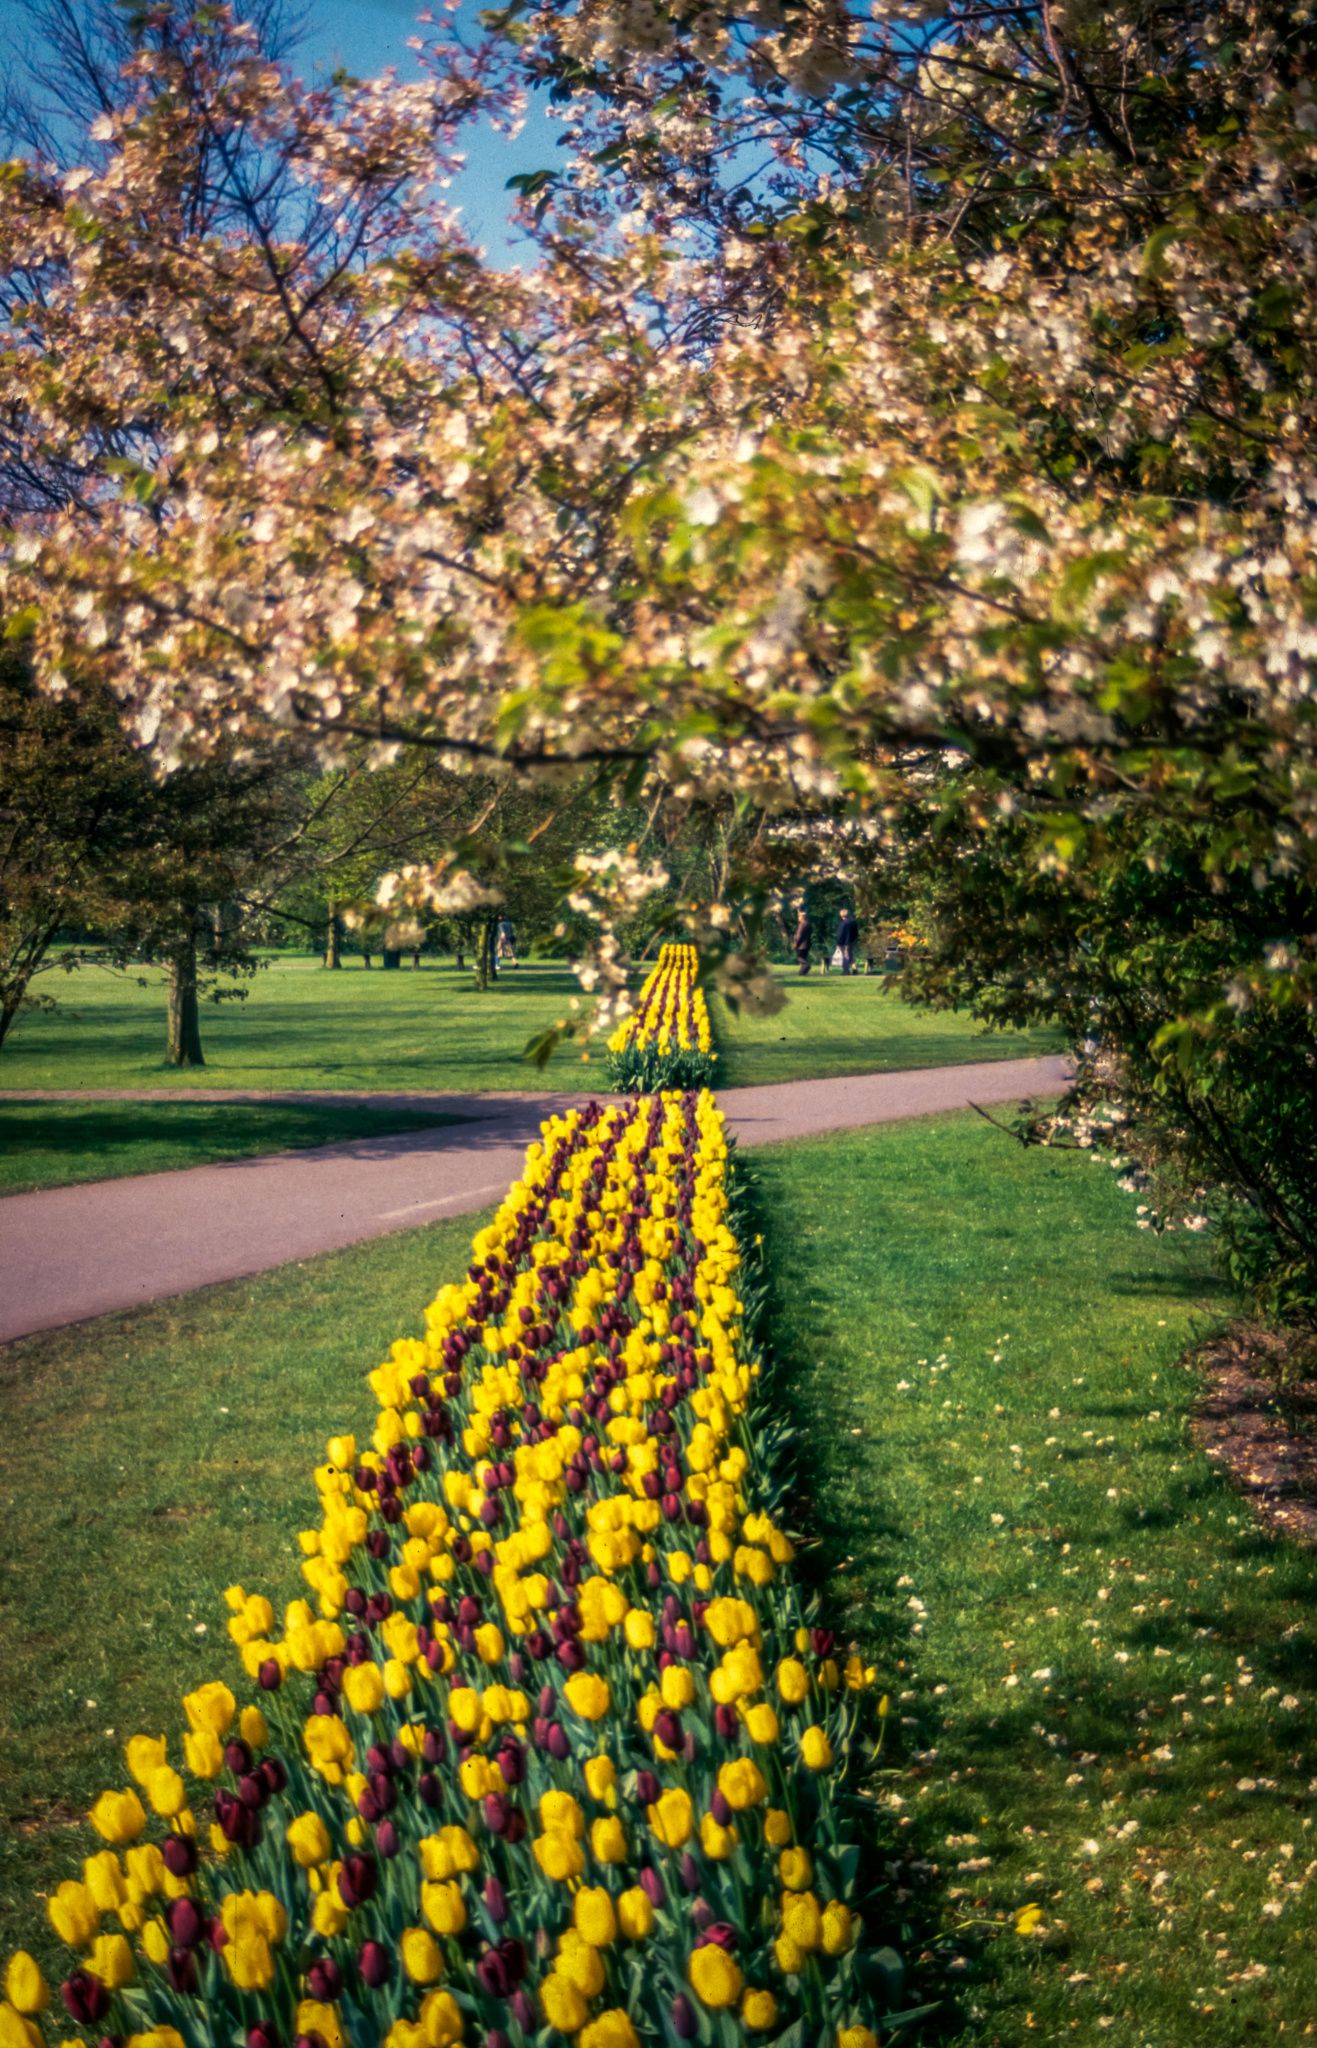 A lot of tulips (Keukenhof - The Netherlands) - Photo : Renaud Cornu-Emieux